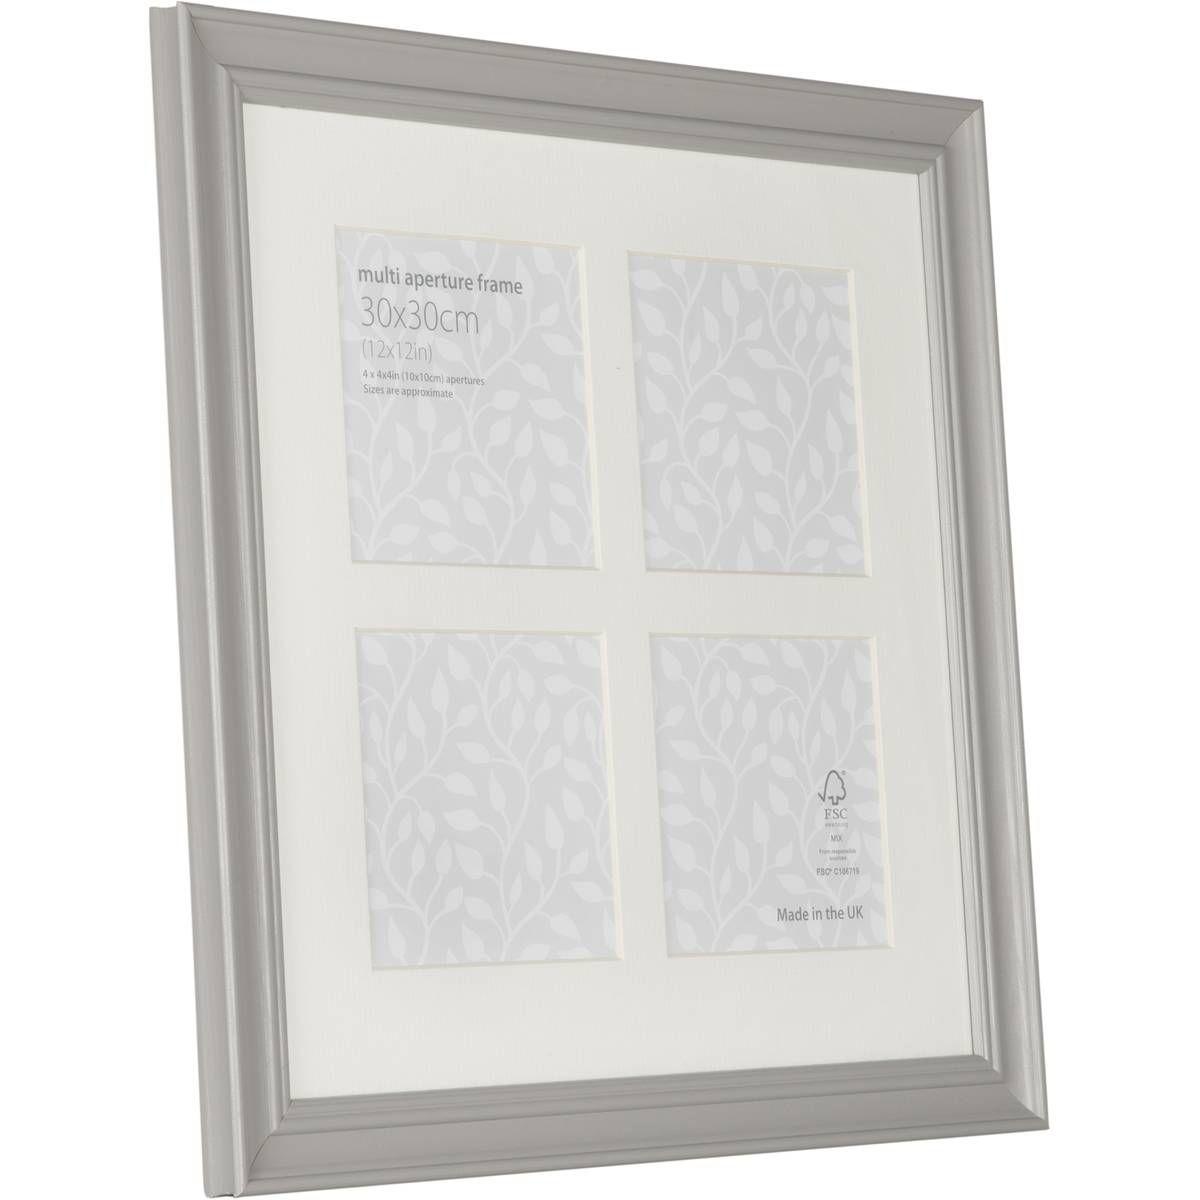 Vintage Grey Multi-Aperture Frame 30 x 30 cm   Aperture and Bedrooms